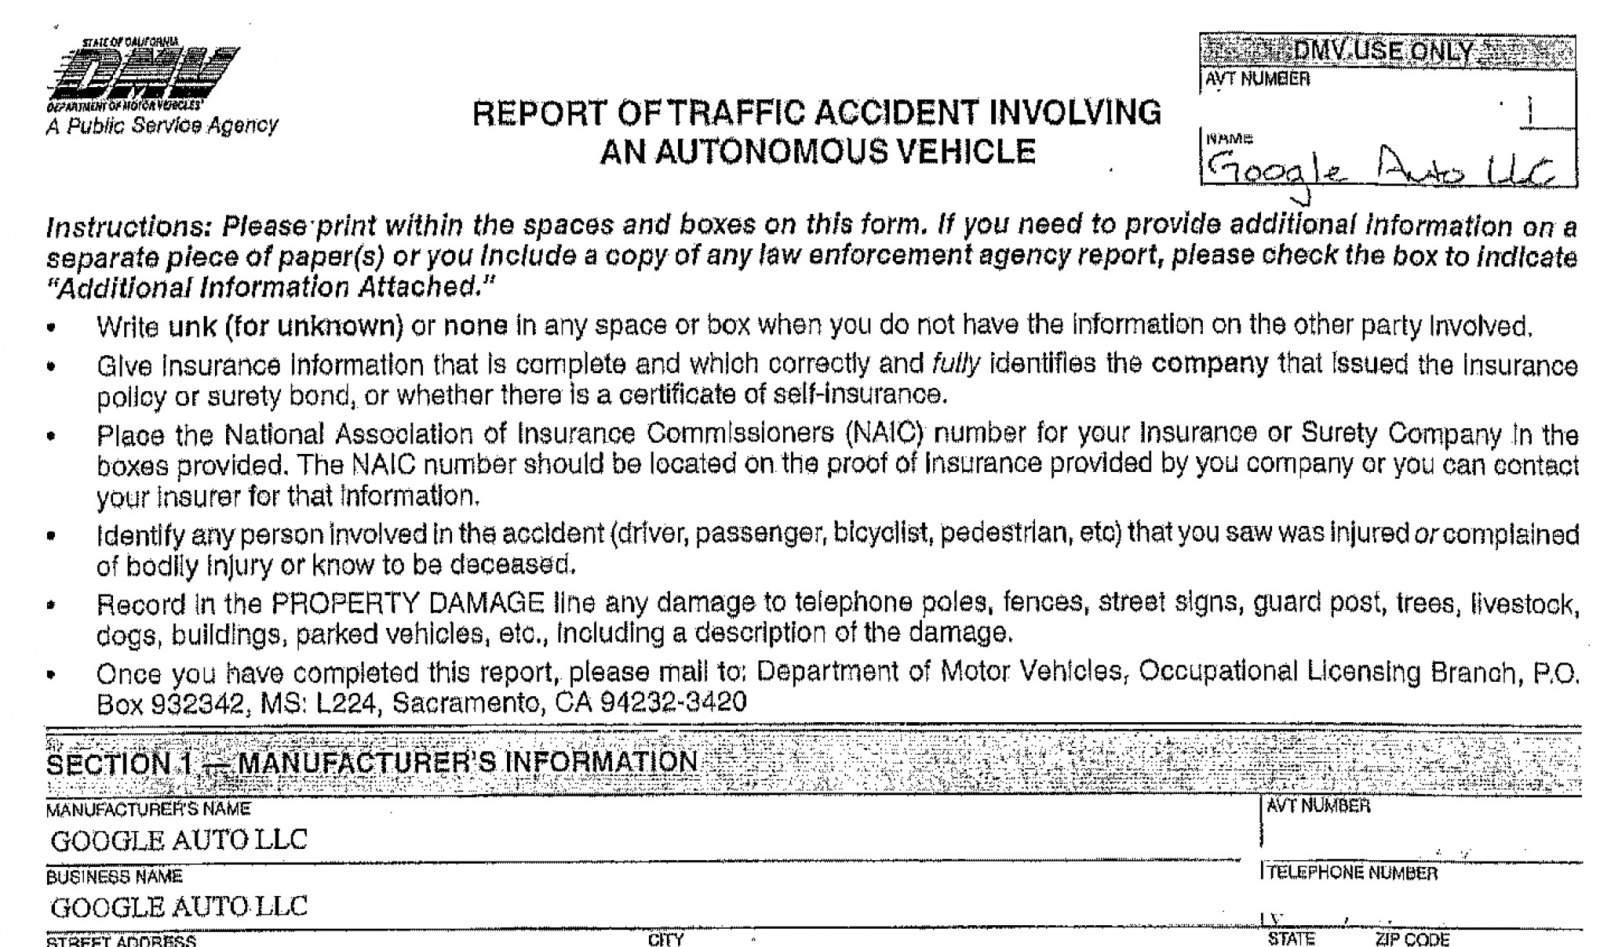 people-cant-stop-running-into-googles-autonomous-cars-image-cultofandroidcomwp-contentuploads201605Google-autonomous-vehicle-accident-report-jpeg